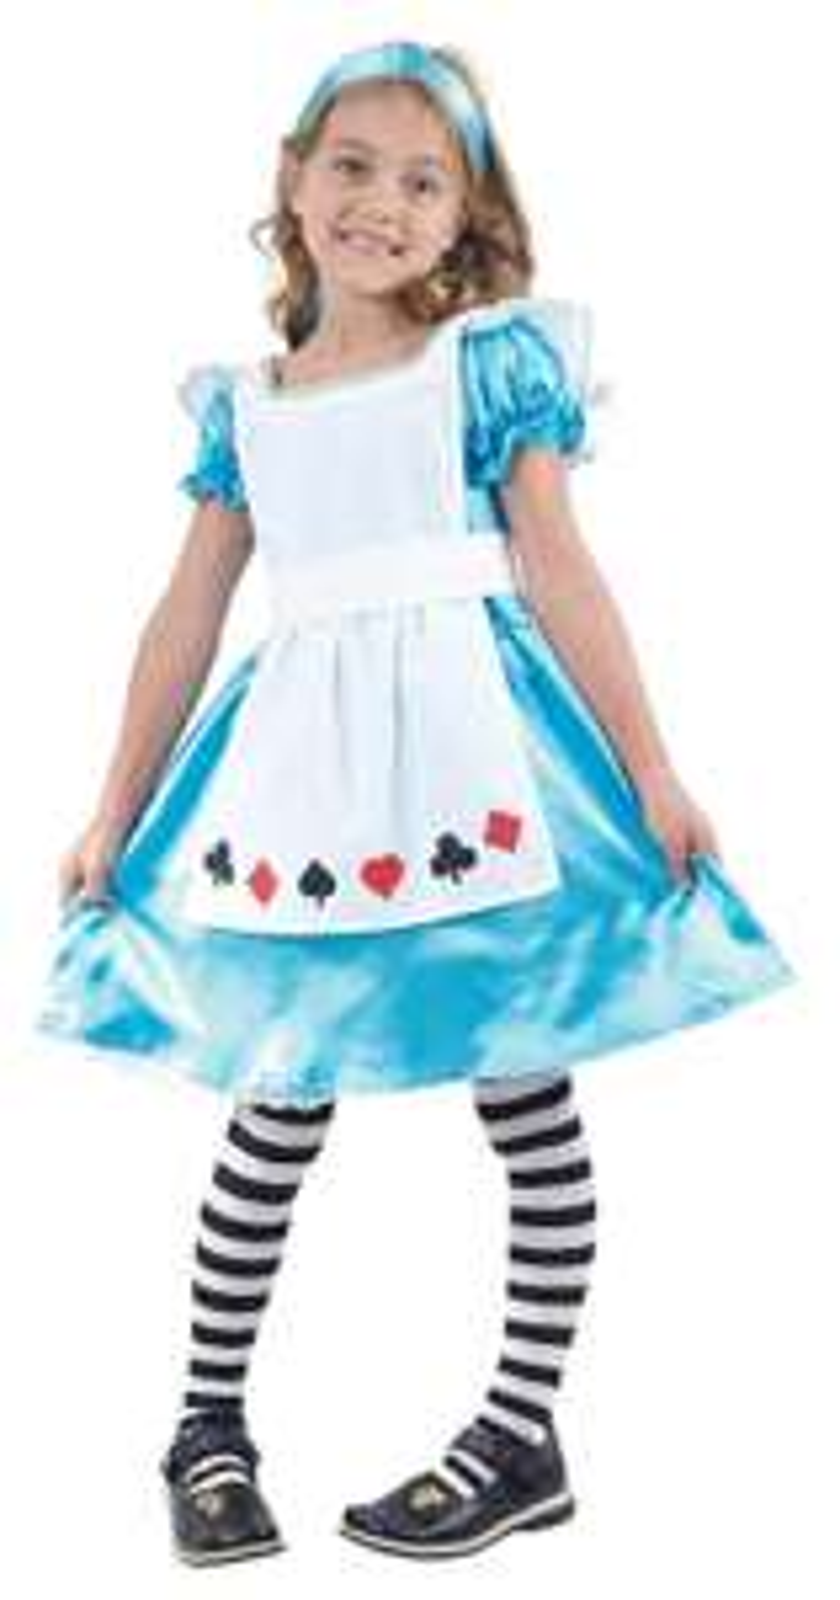 World book day costume (Alice in Wonderland) from £9.98 @ paperumbrellafancydress Ebay